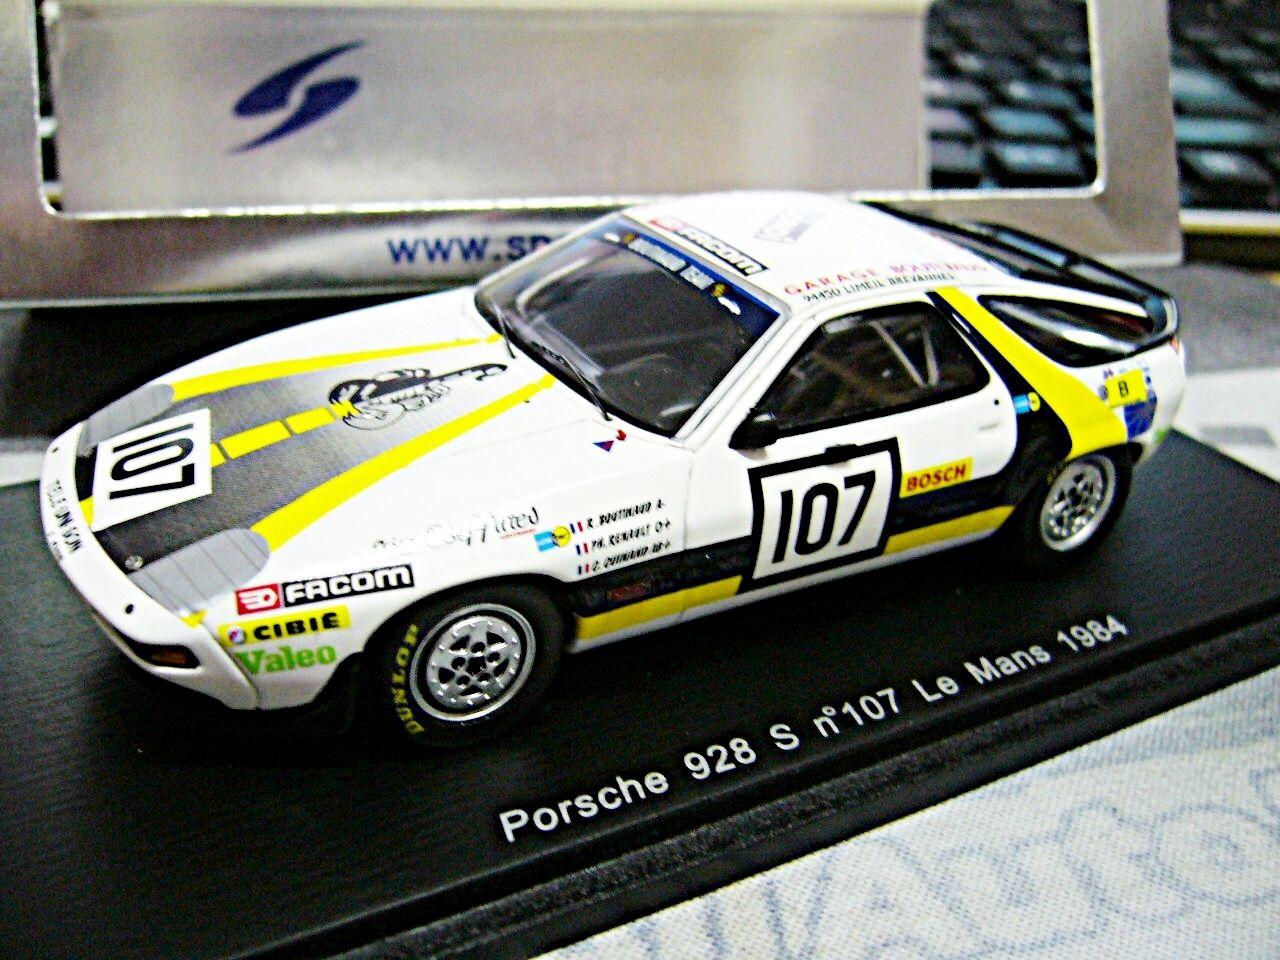 PORSCHE 928 S v8 RACING LE MANS 1984  107 boutinaud RENAULT Spark Resin 1 43